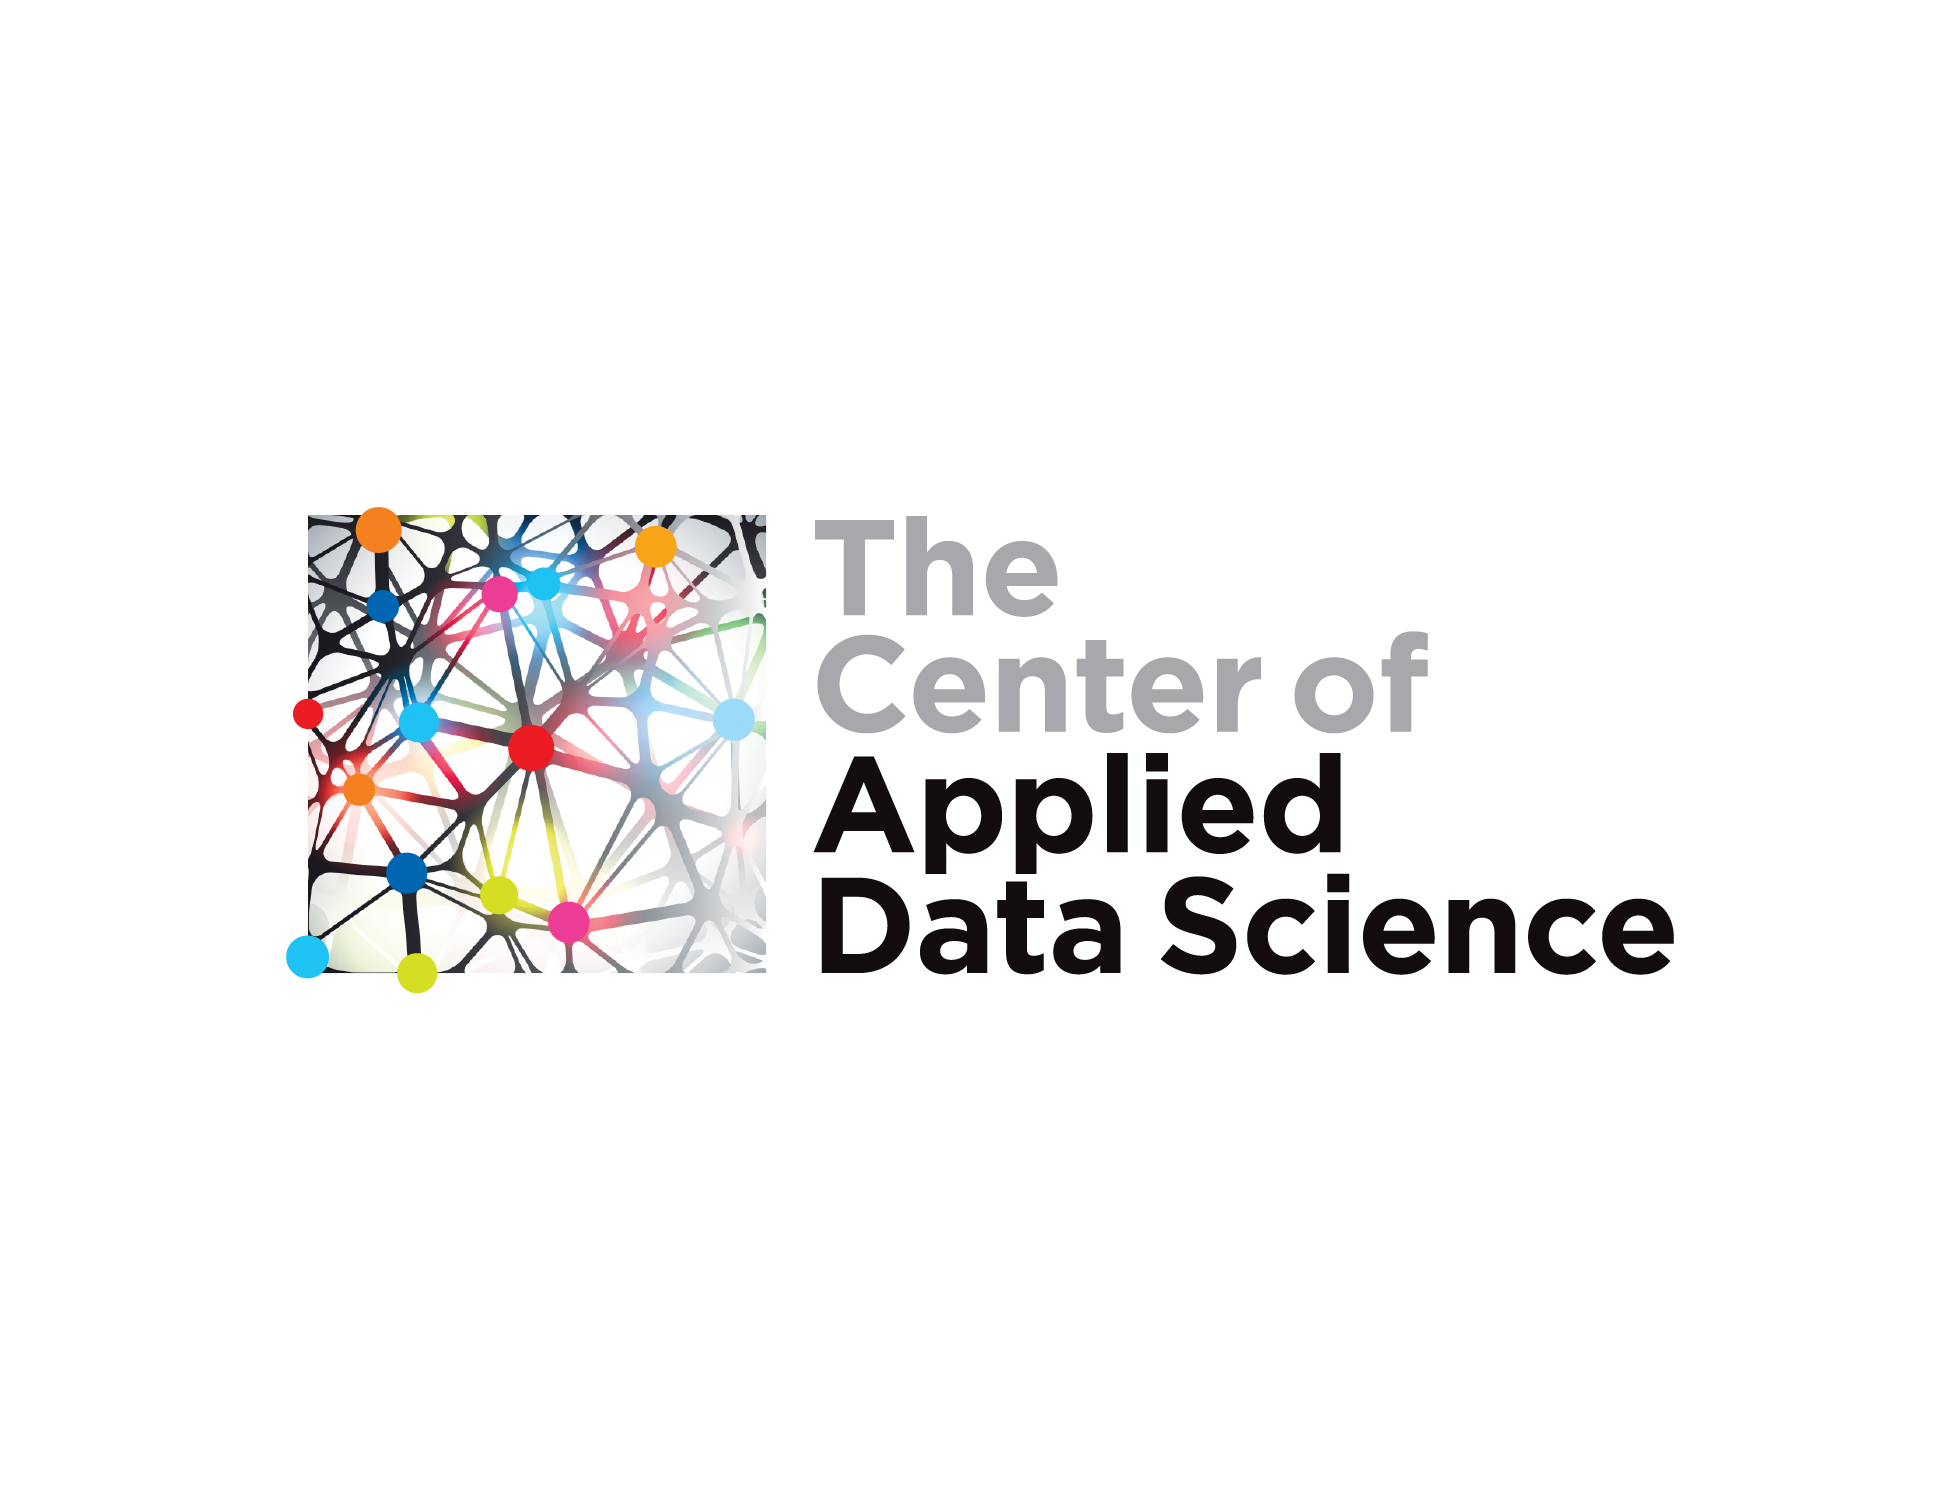 NEXTBIGTECH ASIA - Where AI Meets Data - NEXTBIGTECH ASIA